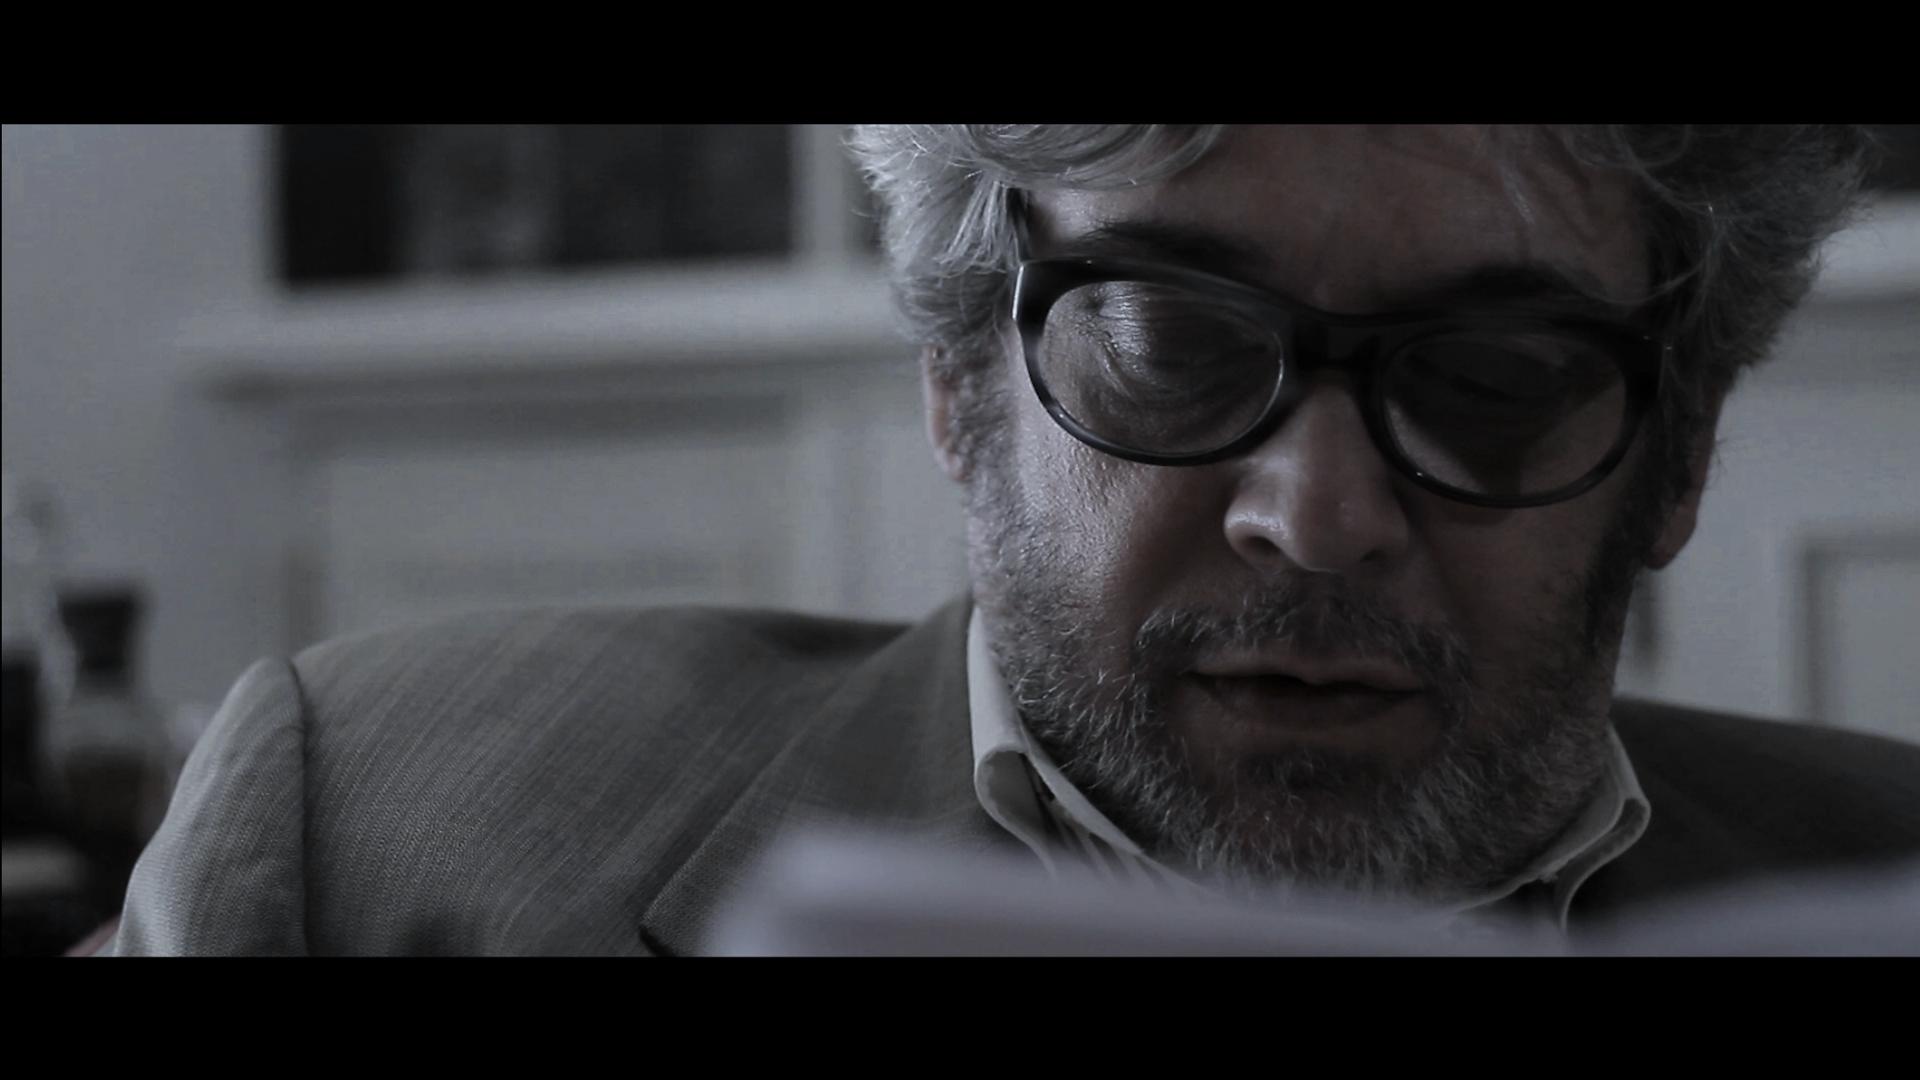 ADreamofPassion_Film_LeeStrasberg_CornerStudio_ShortMovie_1